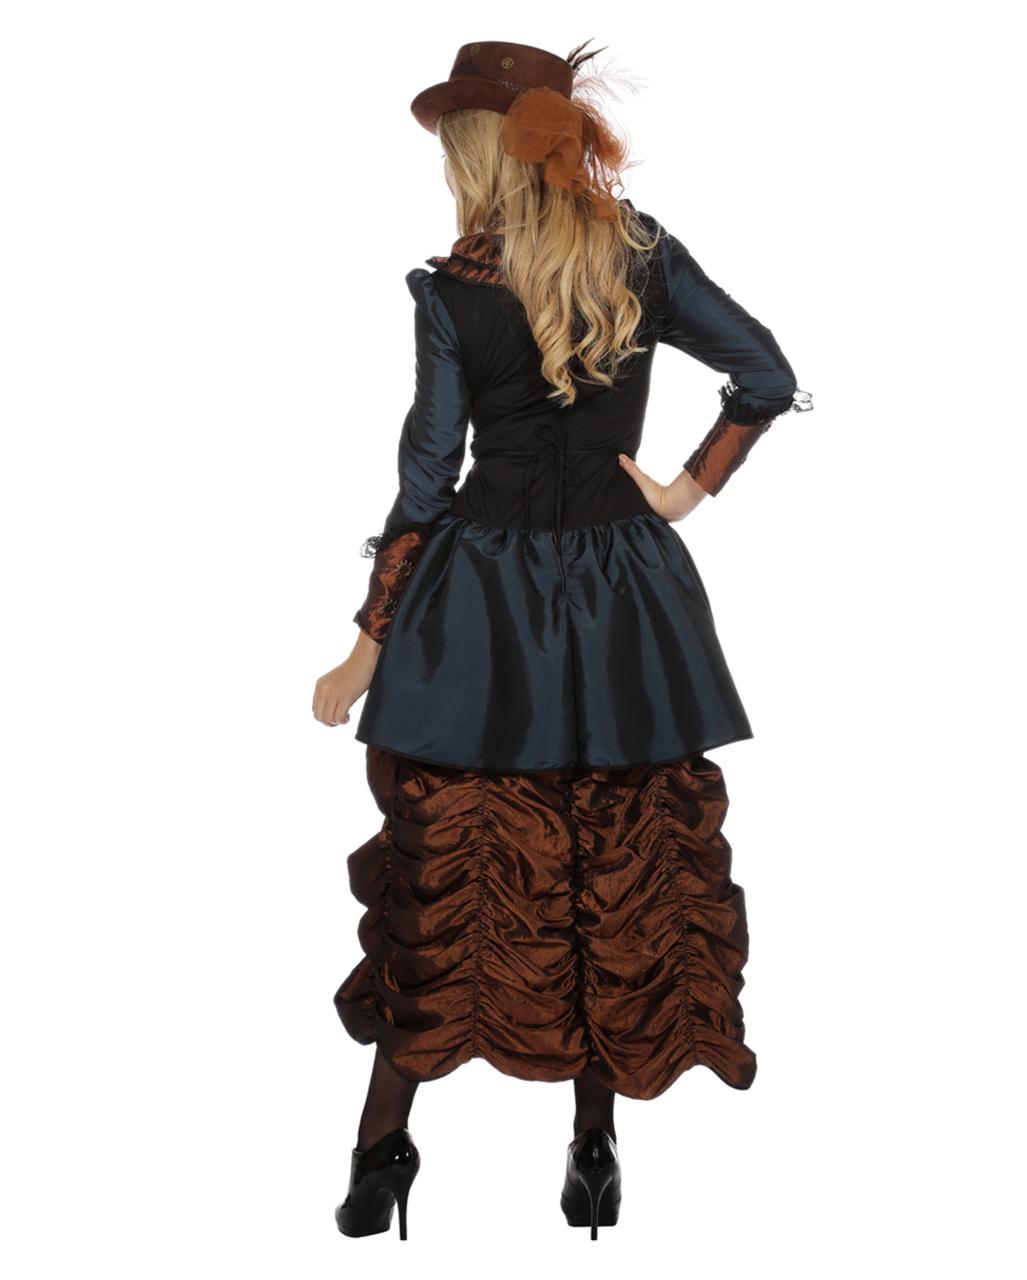 Damen Premium Steampunk Damen Premium Kostüm Kostüm Damen Steampunk Steampunk dxeCoB